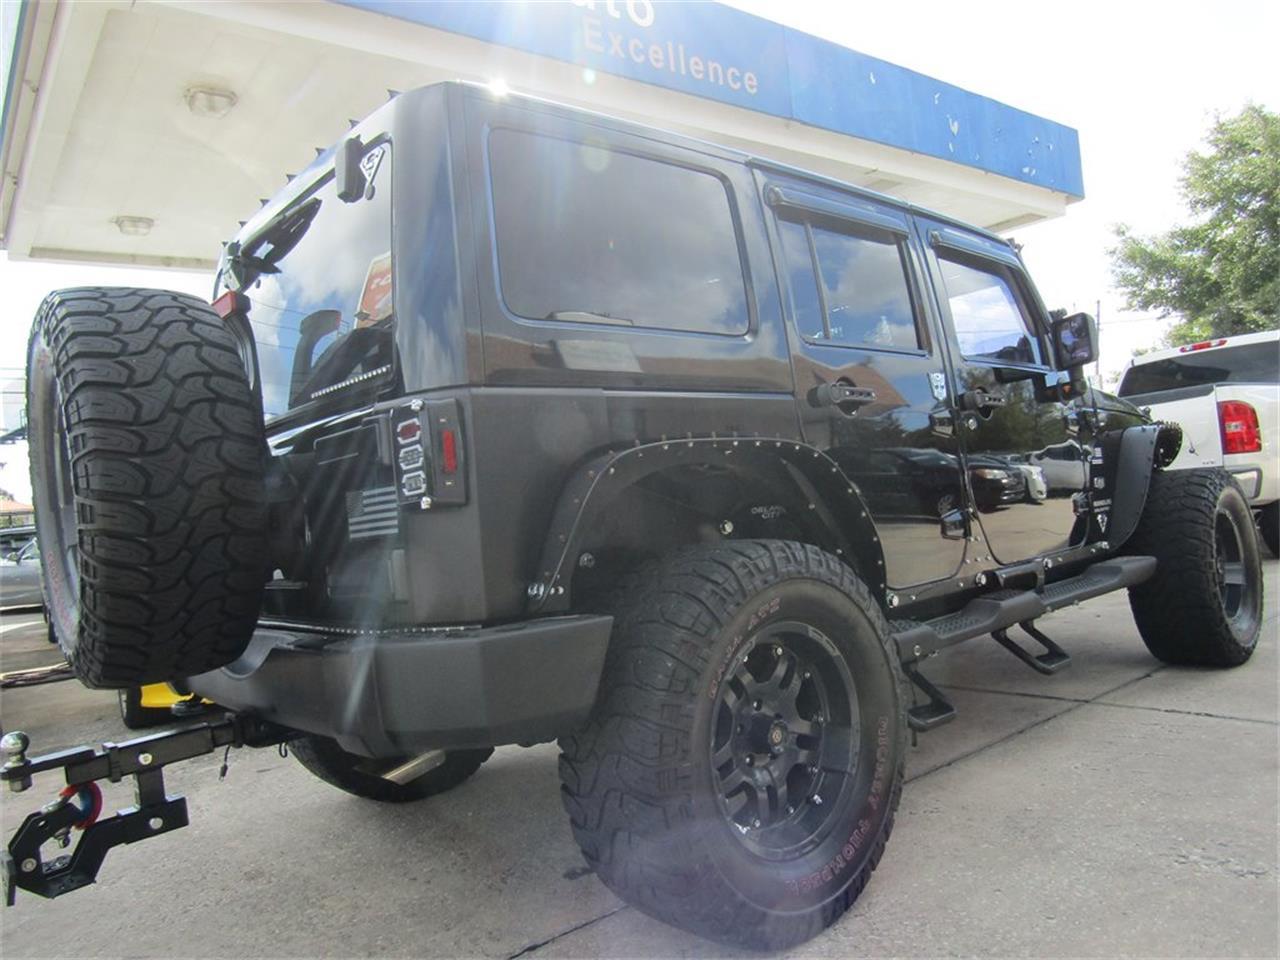 2011 Jeep Wrangler (CC-1266417) for sale in Orlando, Florida